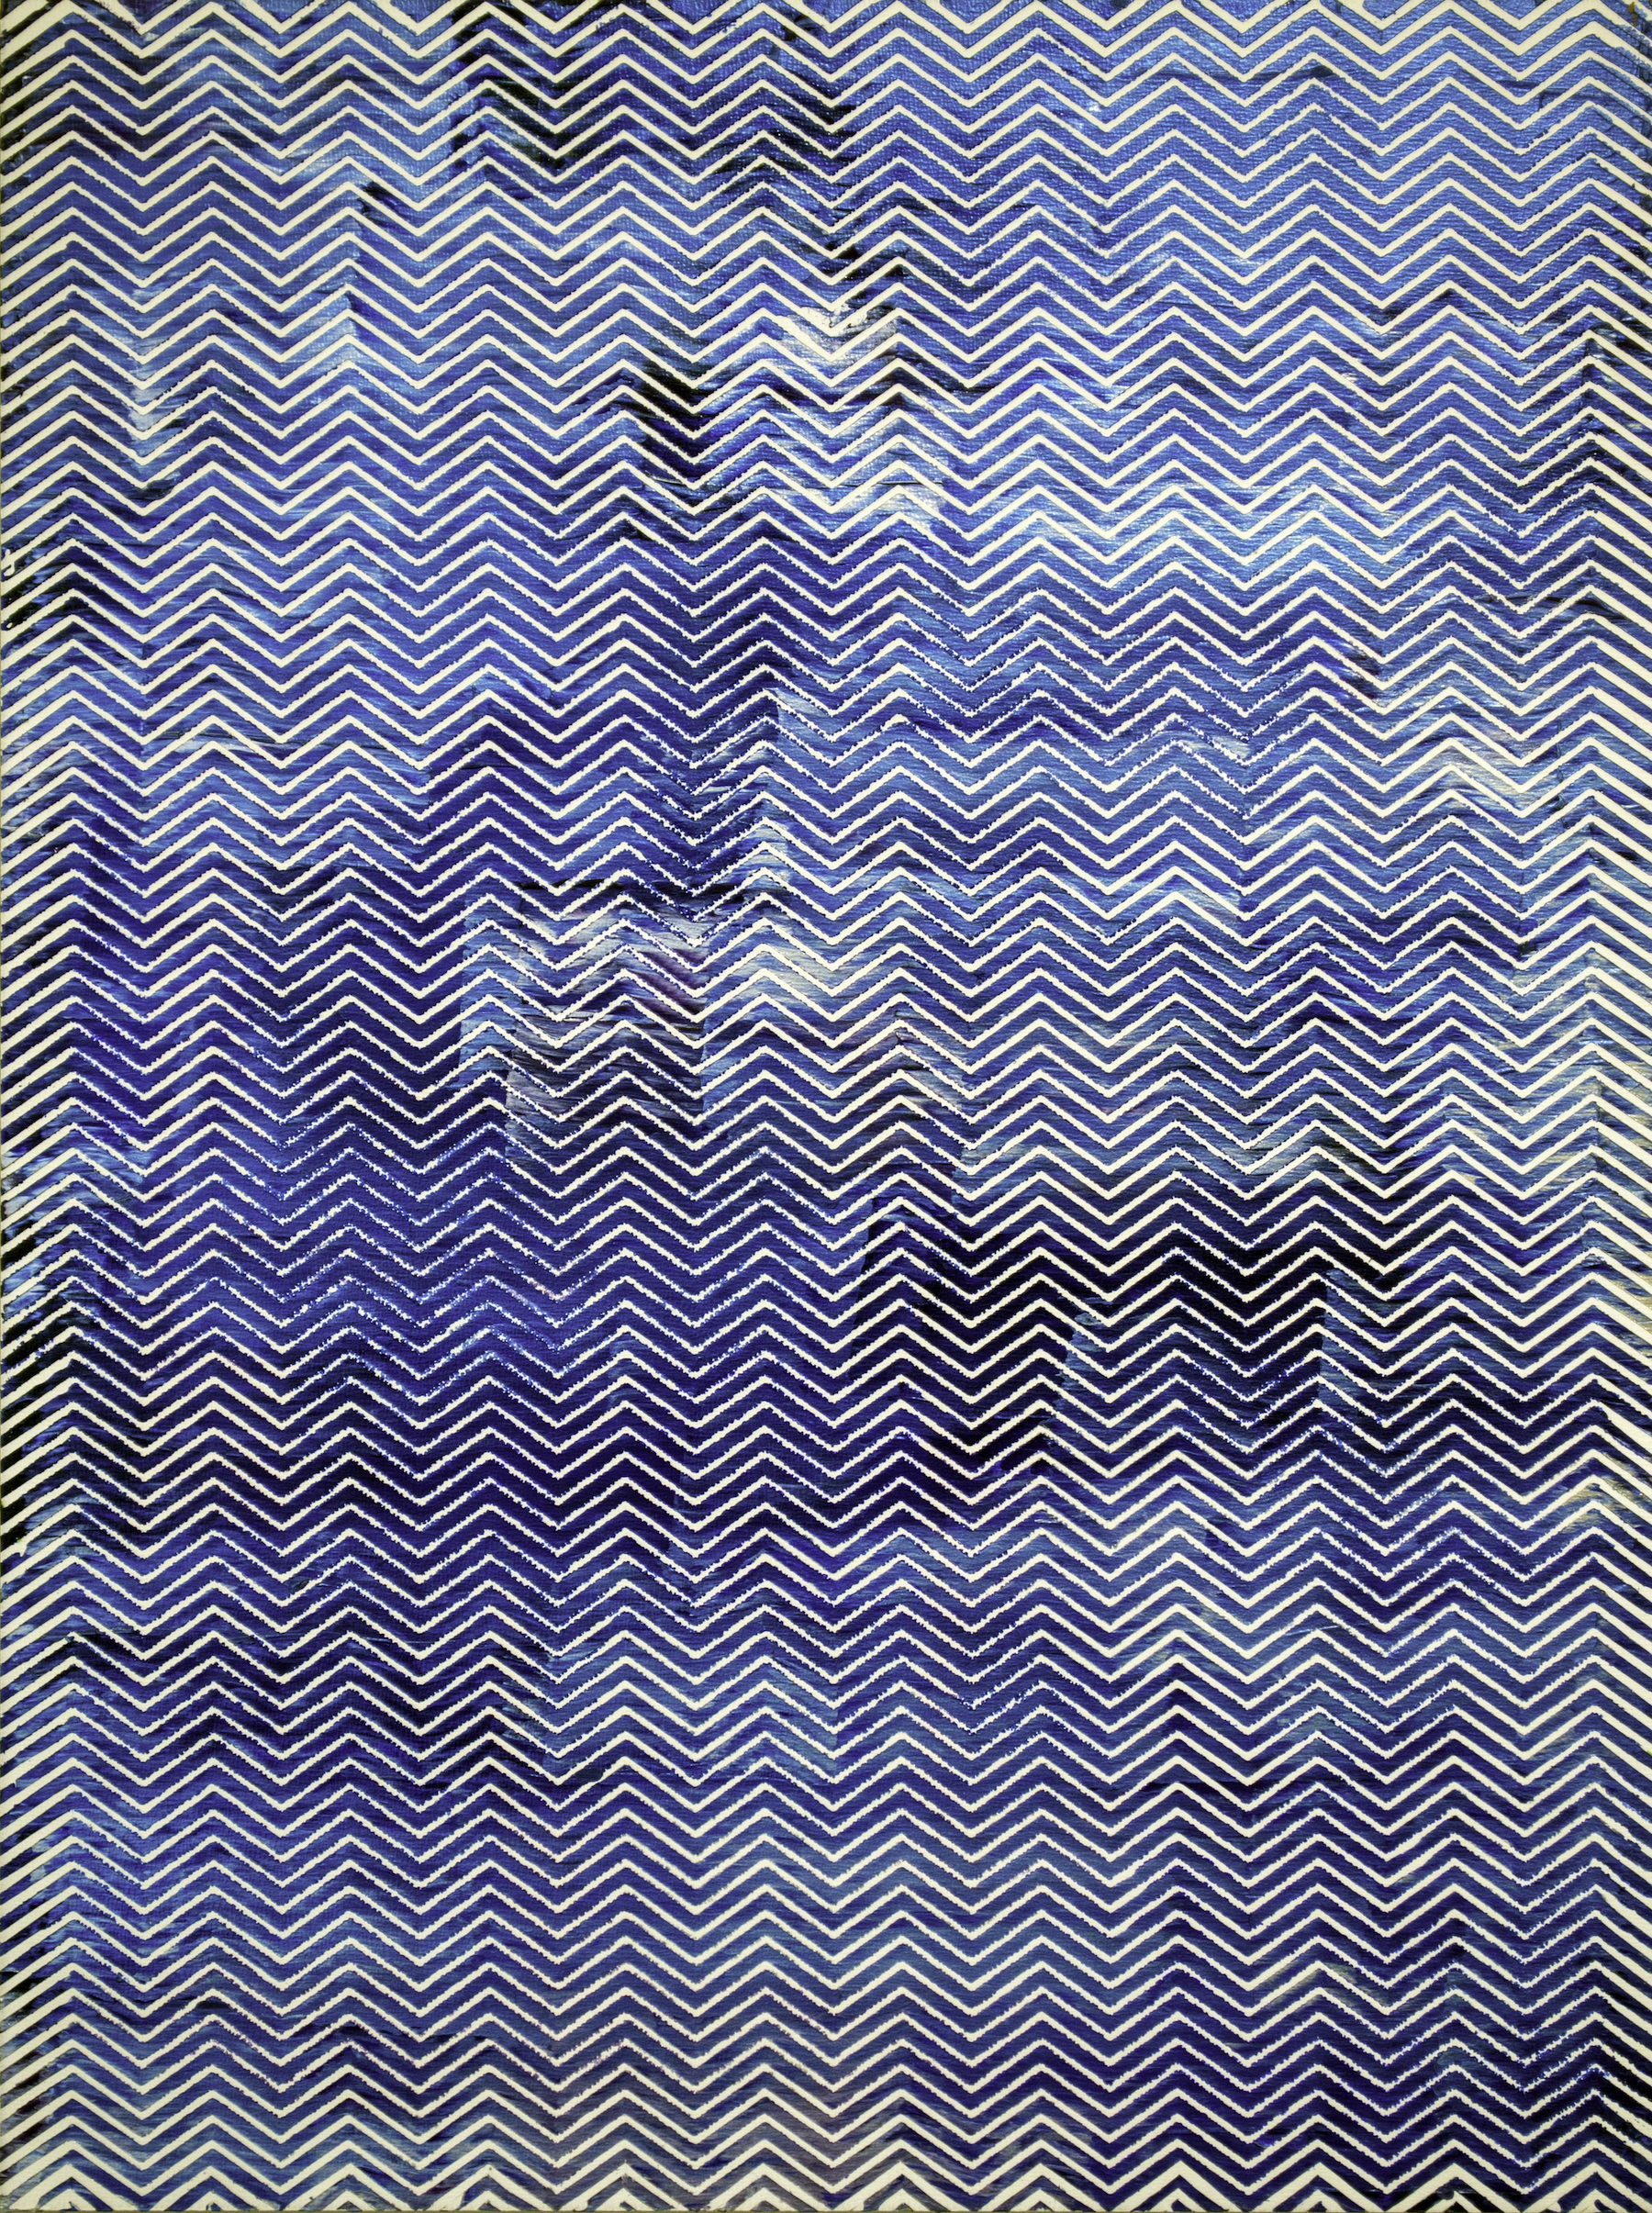 HUE Gallery of Contemporary Art - Sean Christopher Ward - Ocean of Wonder - Acrylic on MDF - 12x16 - 2019 - $375.jpg